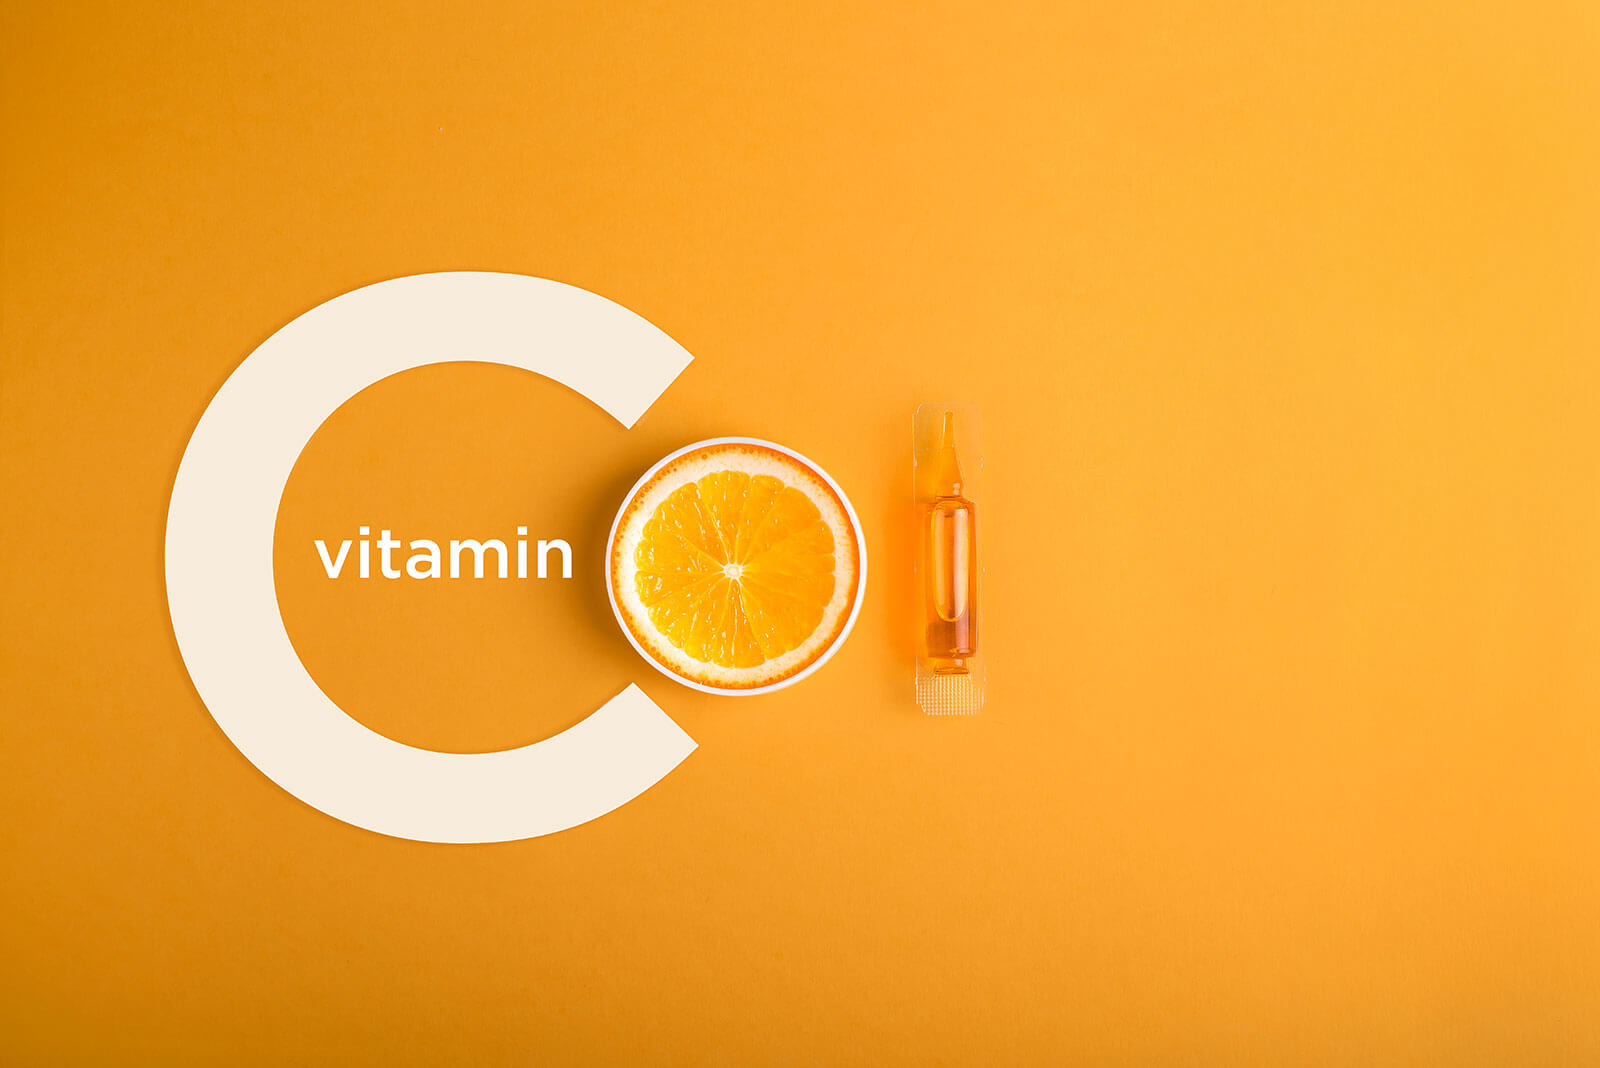 Why you need vitamin C this season to restore immunity